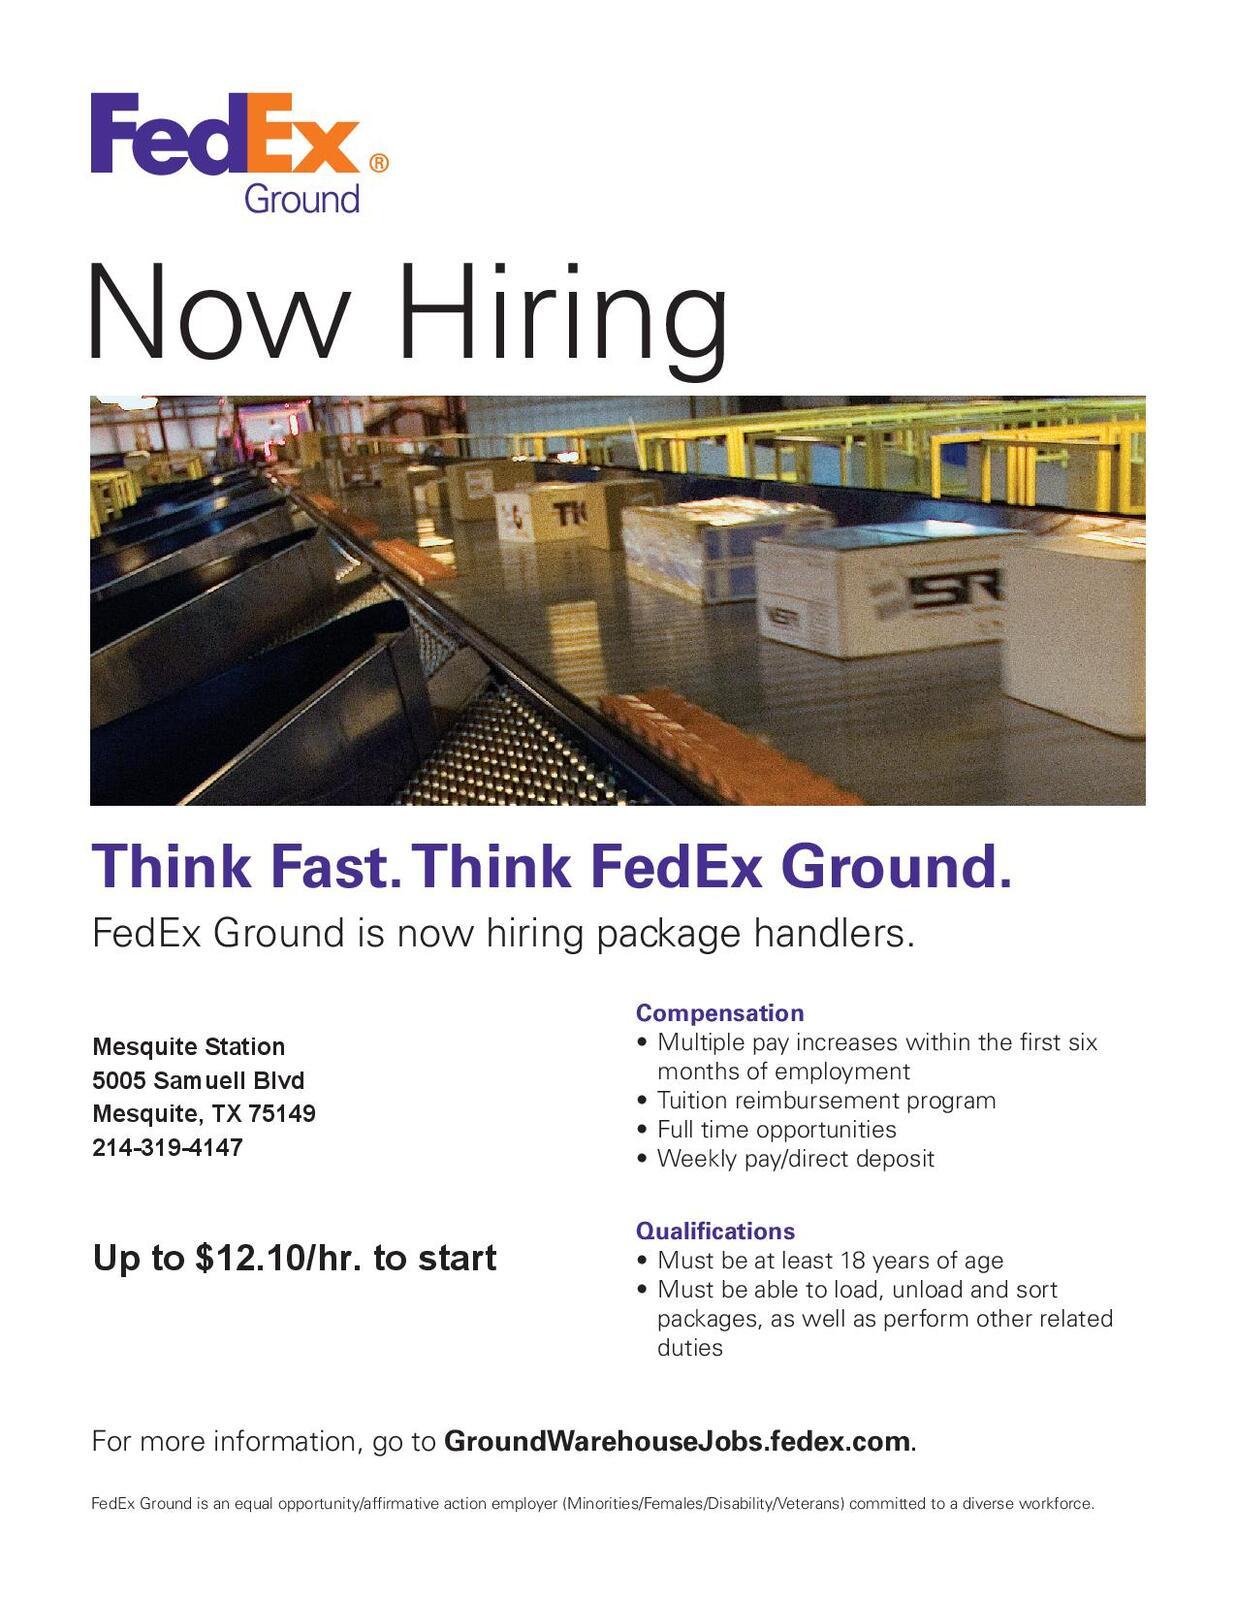 FedEx Ground now hiring package handlers City of Mesquite